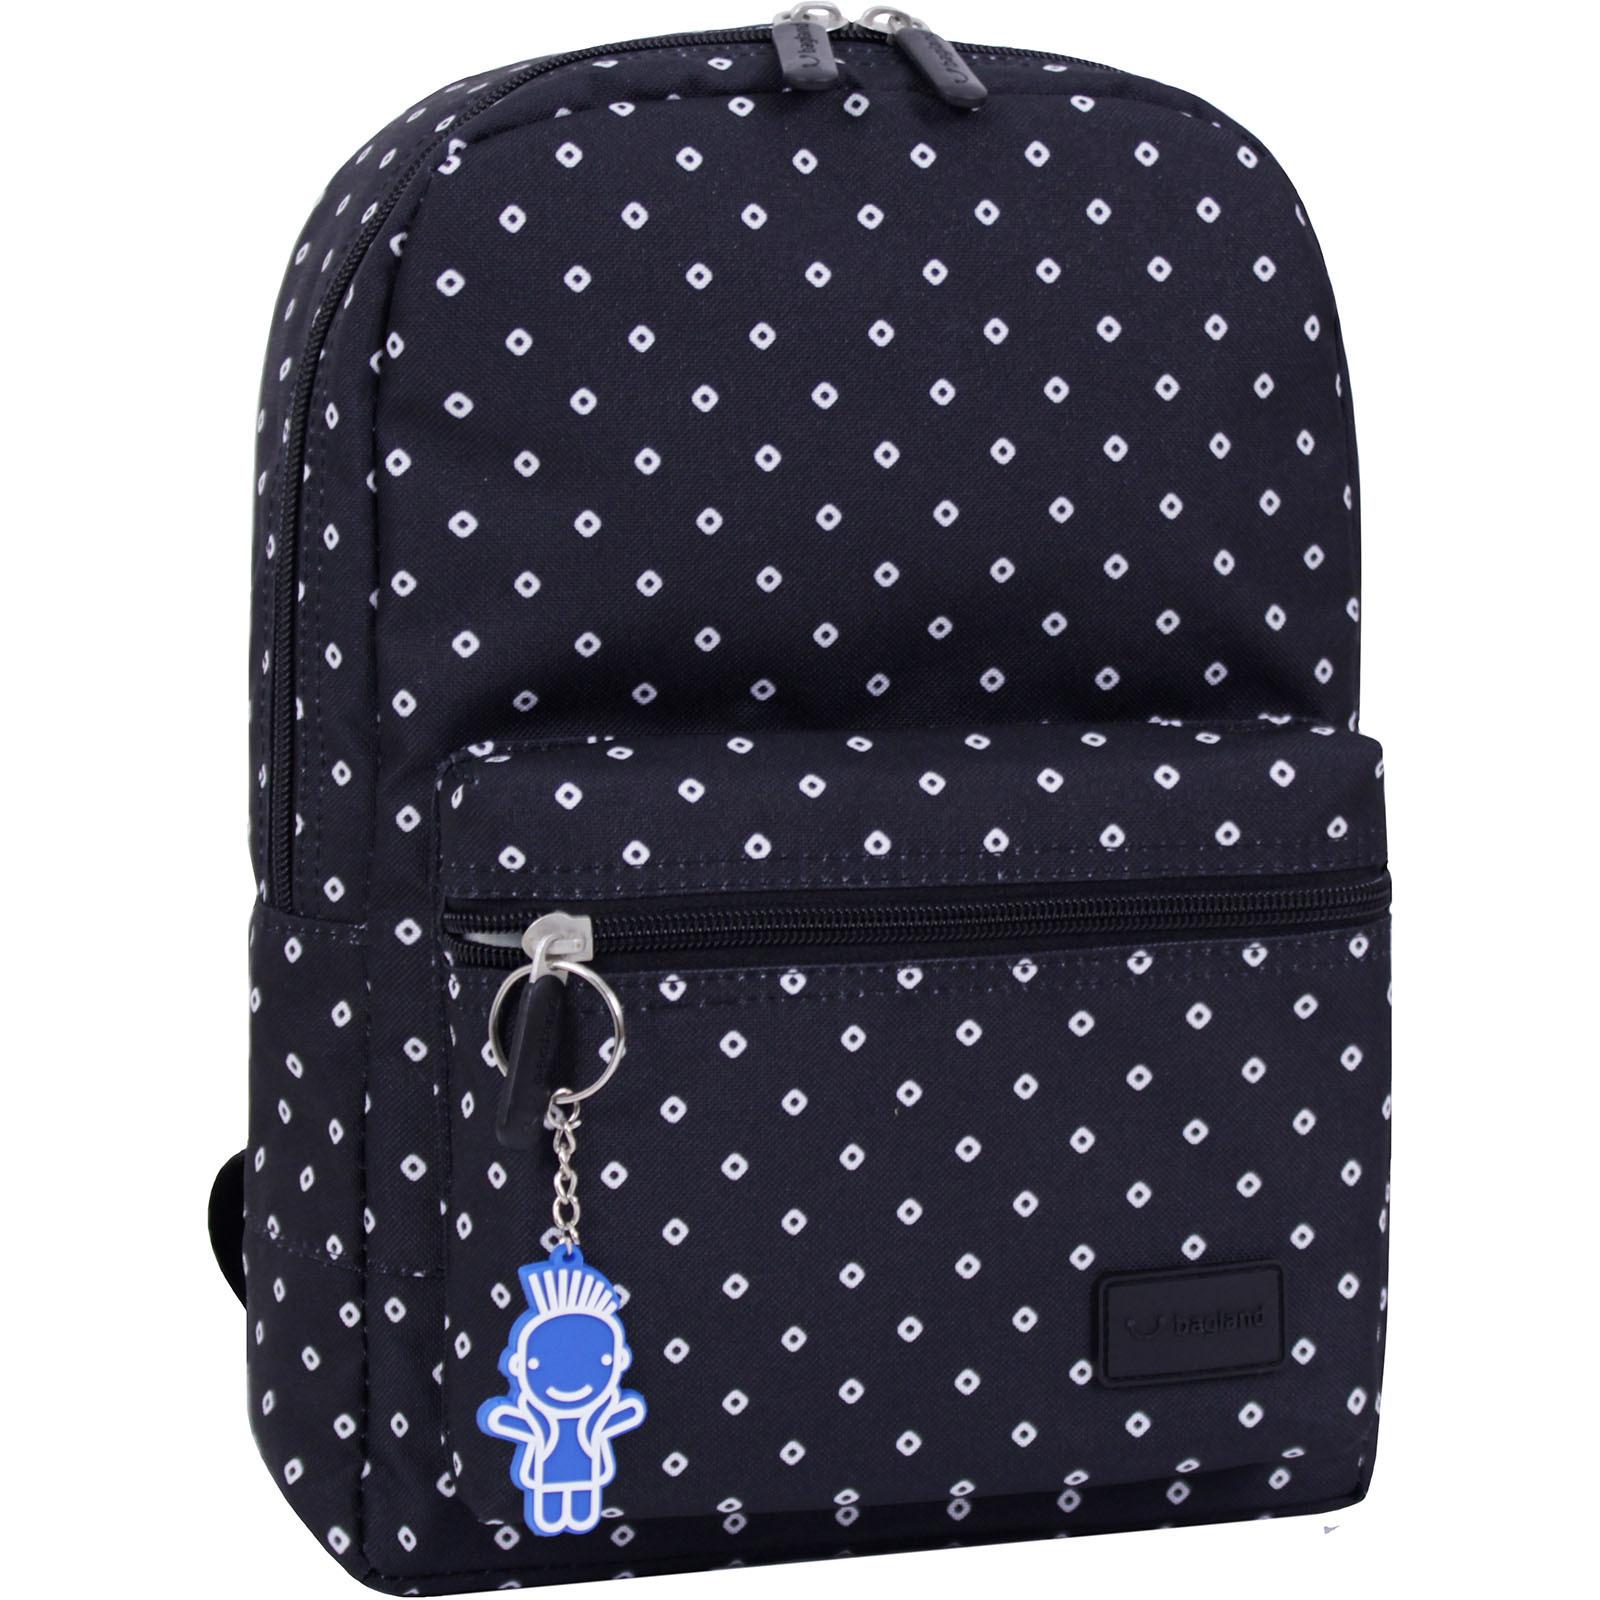 Молодежные рюкзаки Рюкзак Bagland Молодежный mini 8 л. сублимация 462 (00508664) IMG_3768_суб.462_.JPG